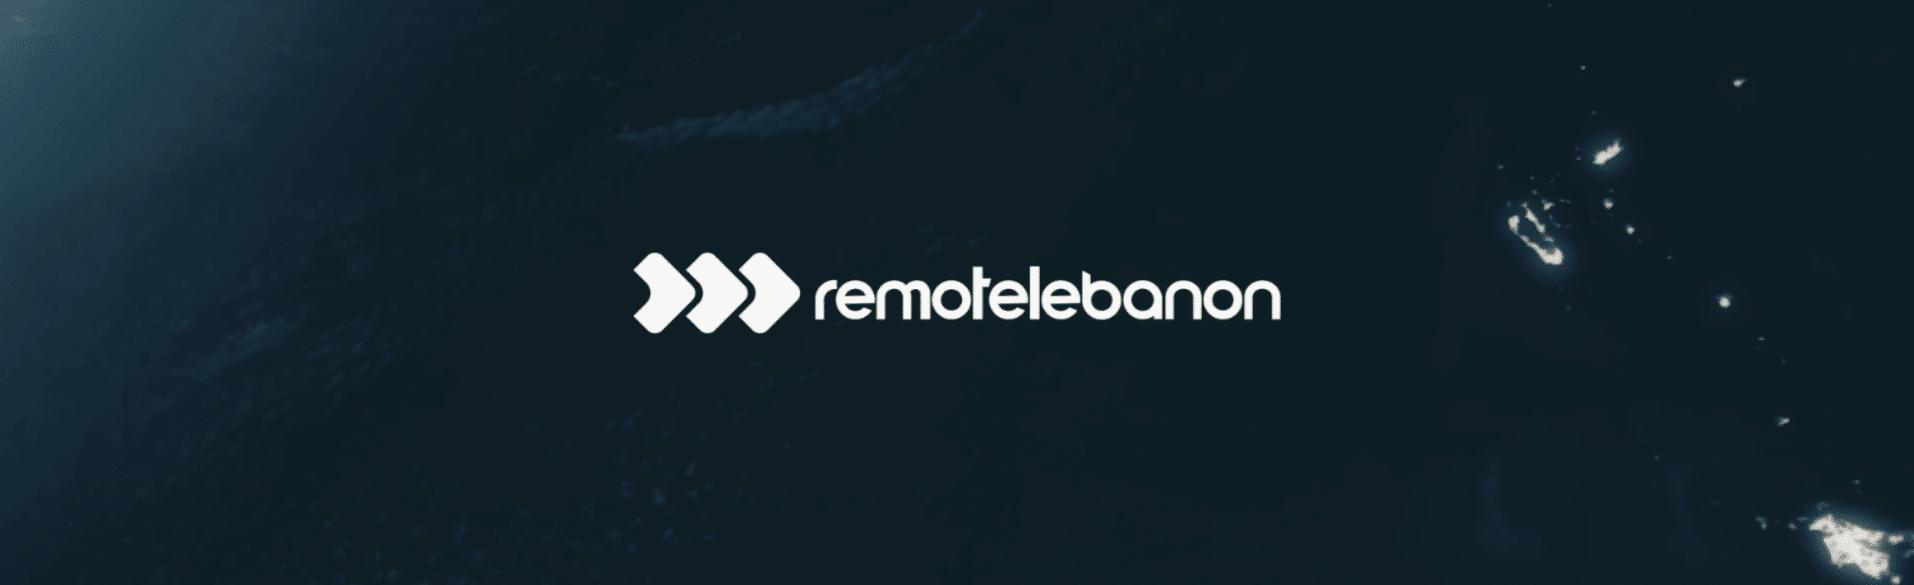 remotelebanon.com